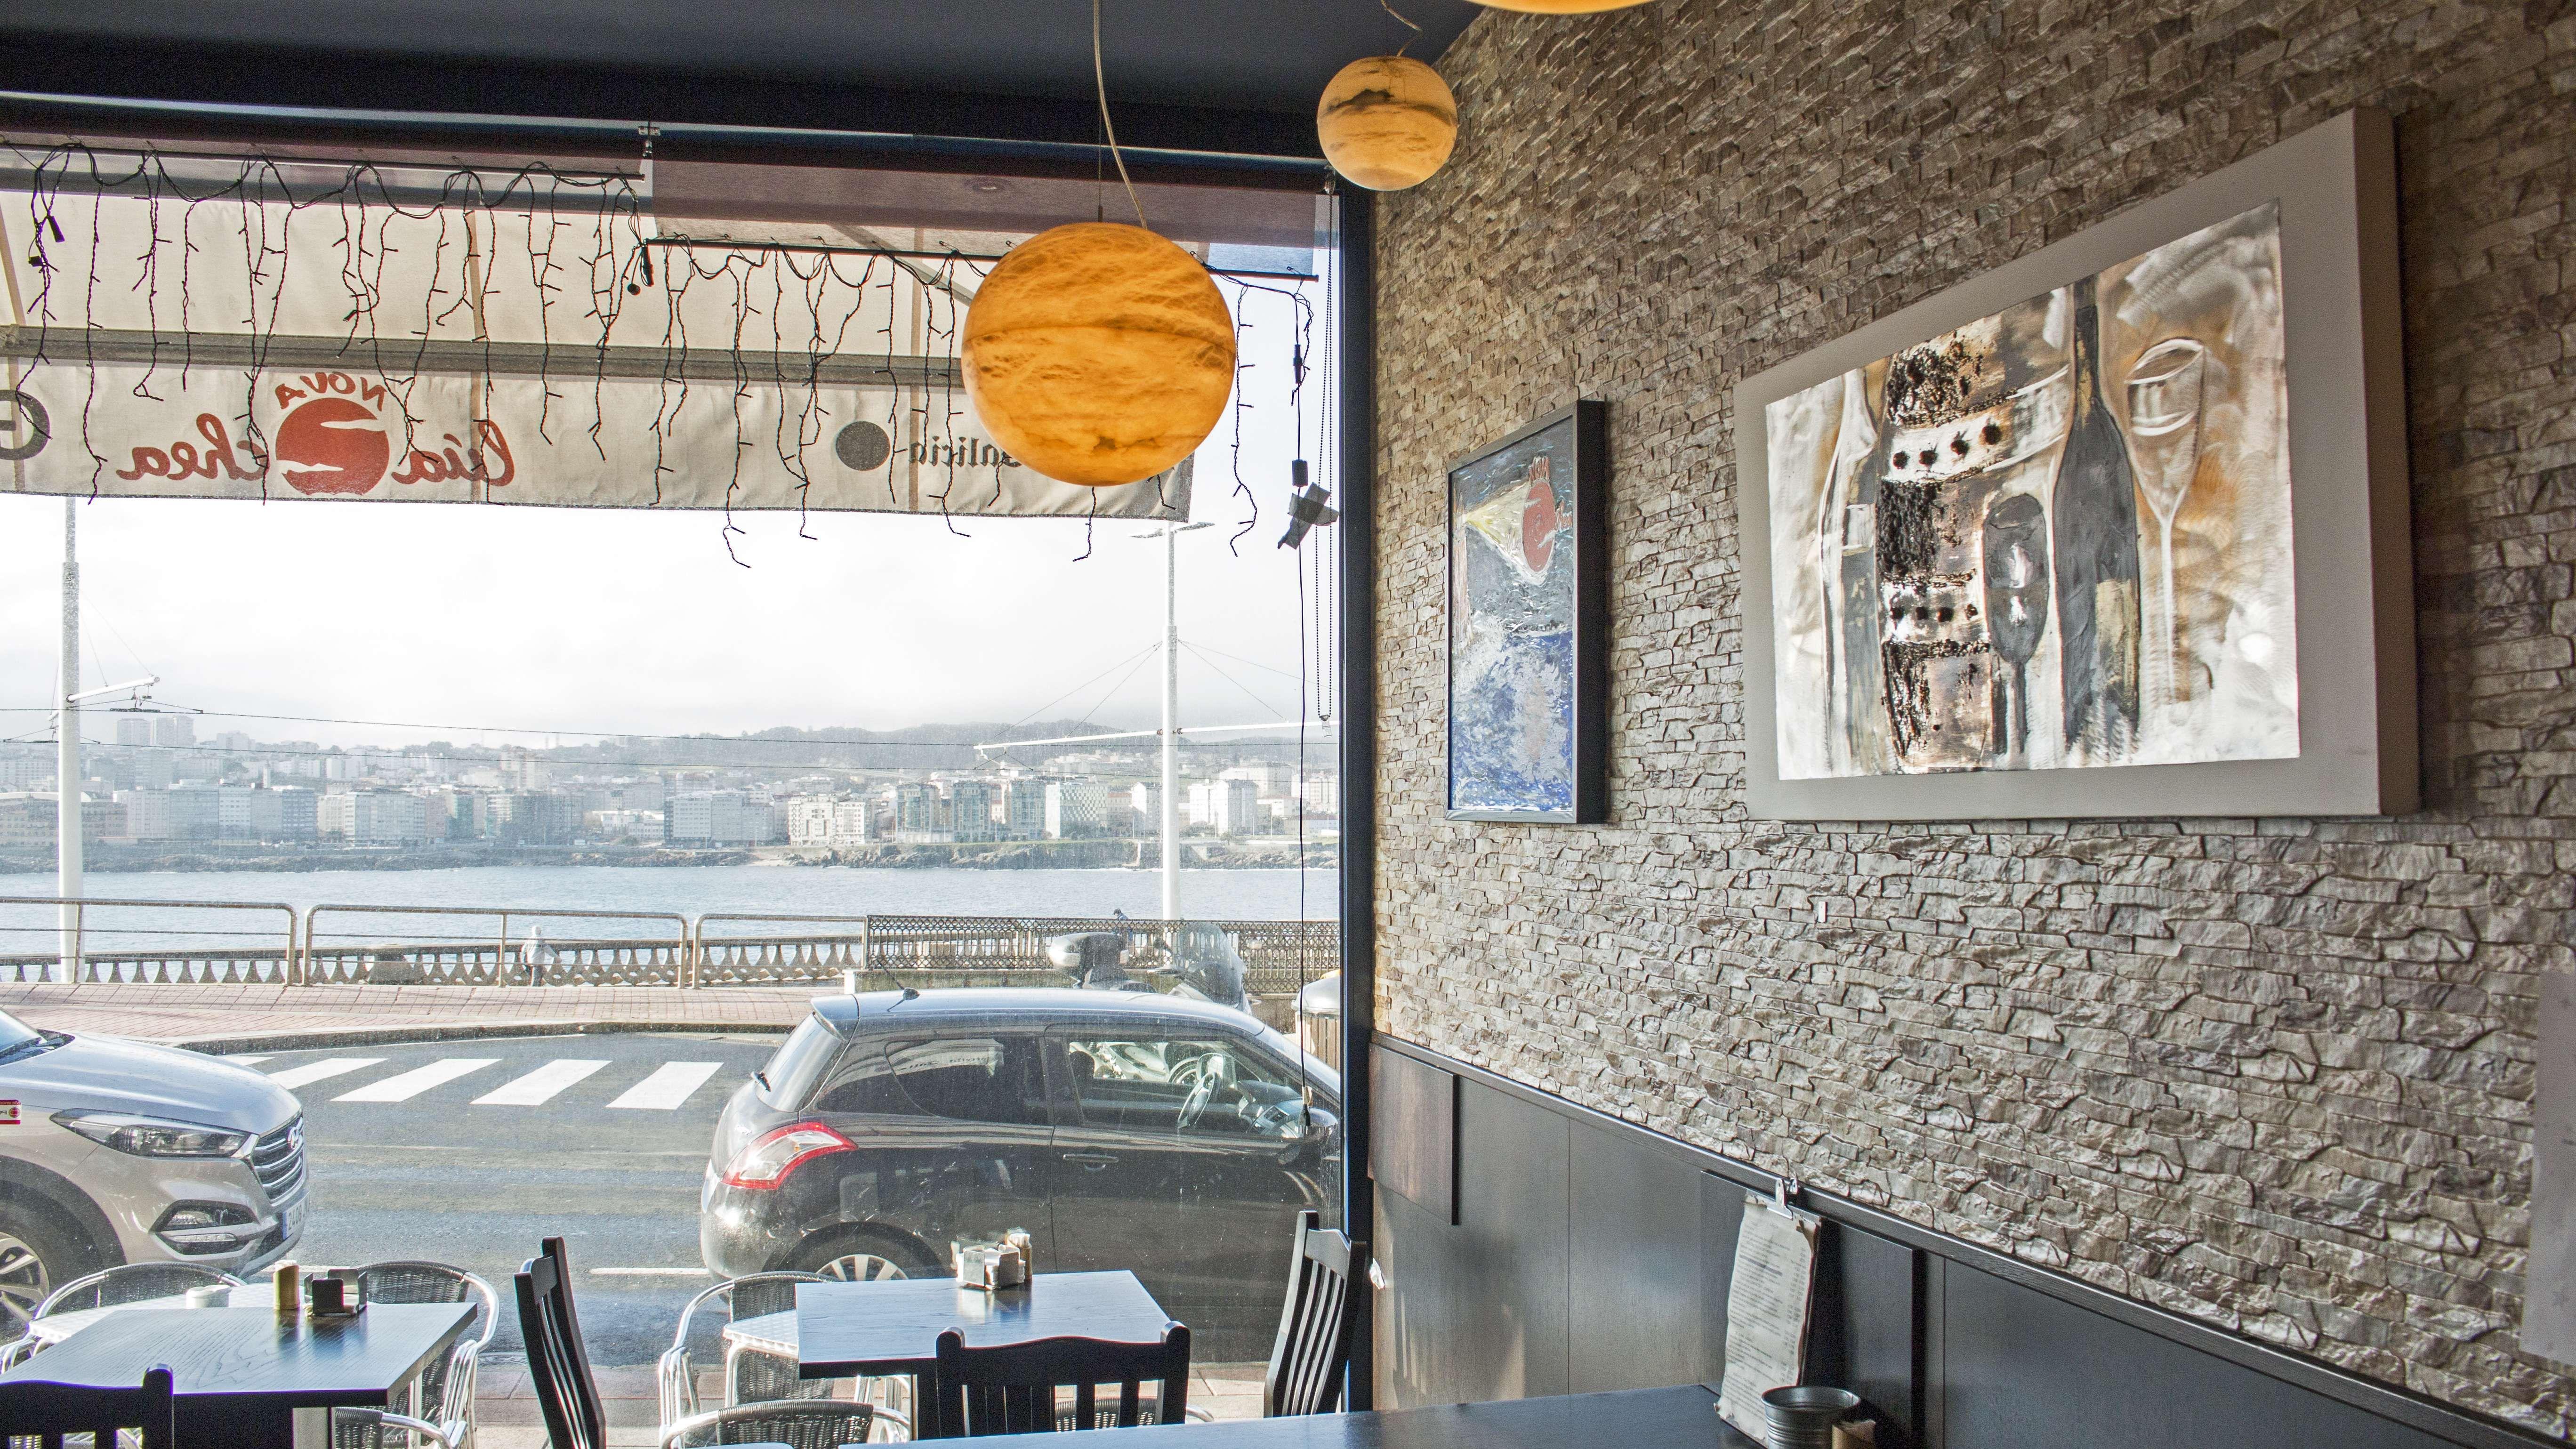 Restaurante de referencia en A Coruña